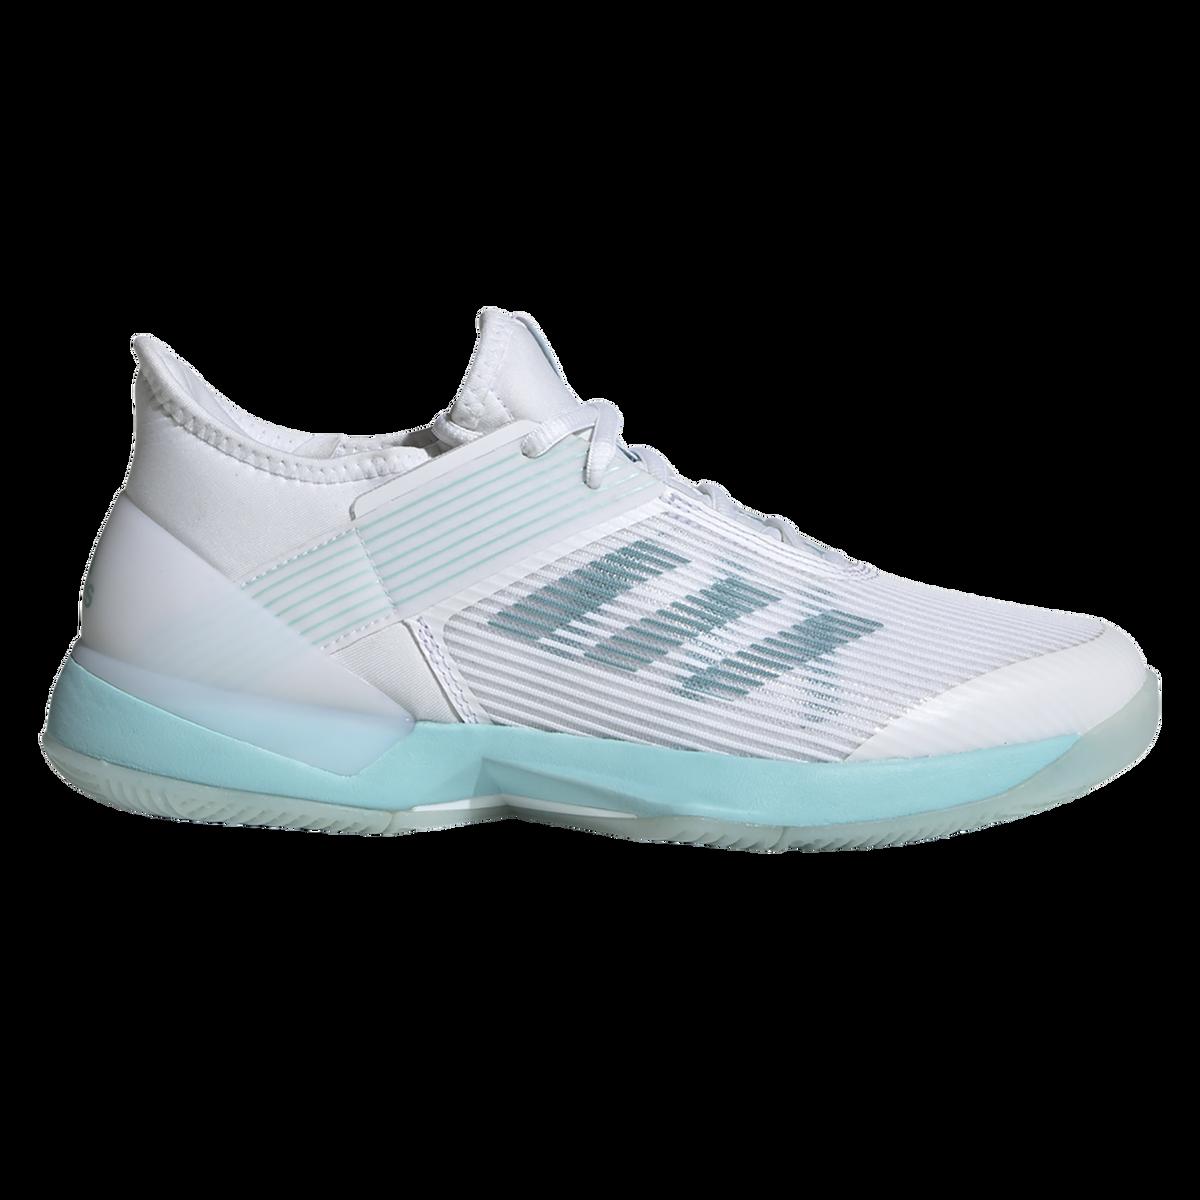 f5842f2e96 adizero Ubersonic 3 x Parley Women's Tennis Shoe - White/Blue